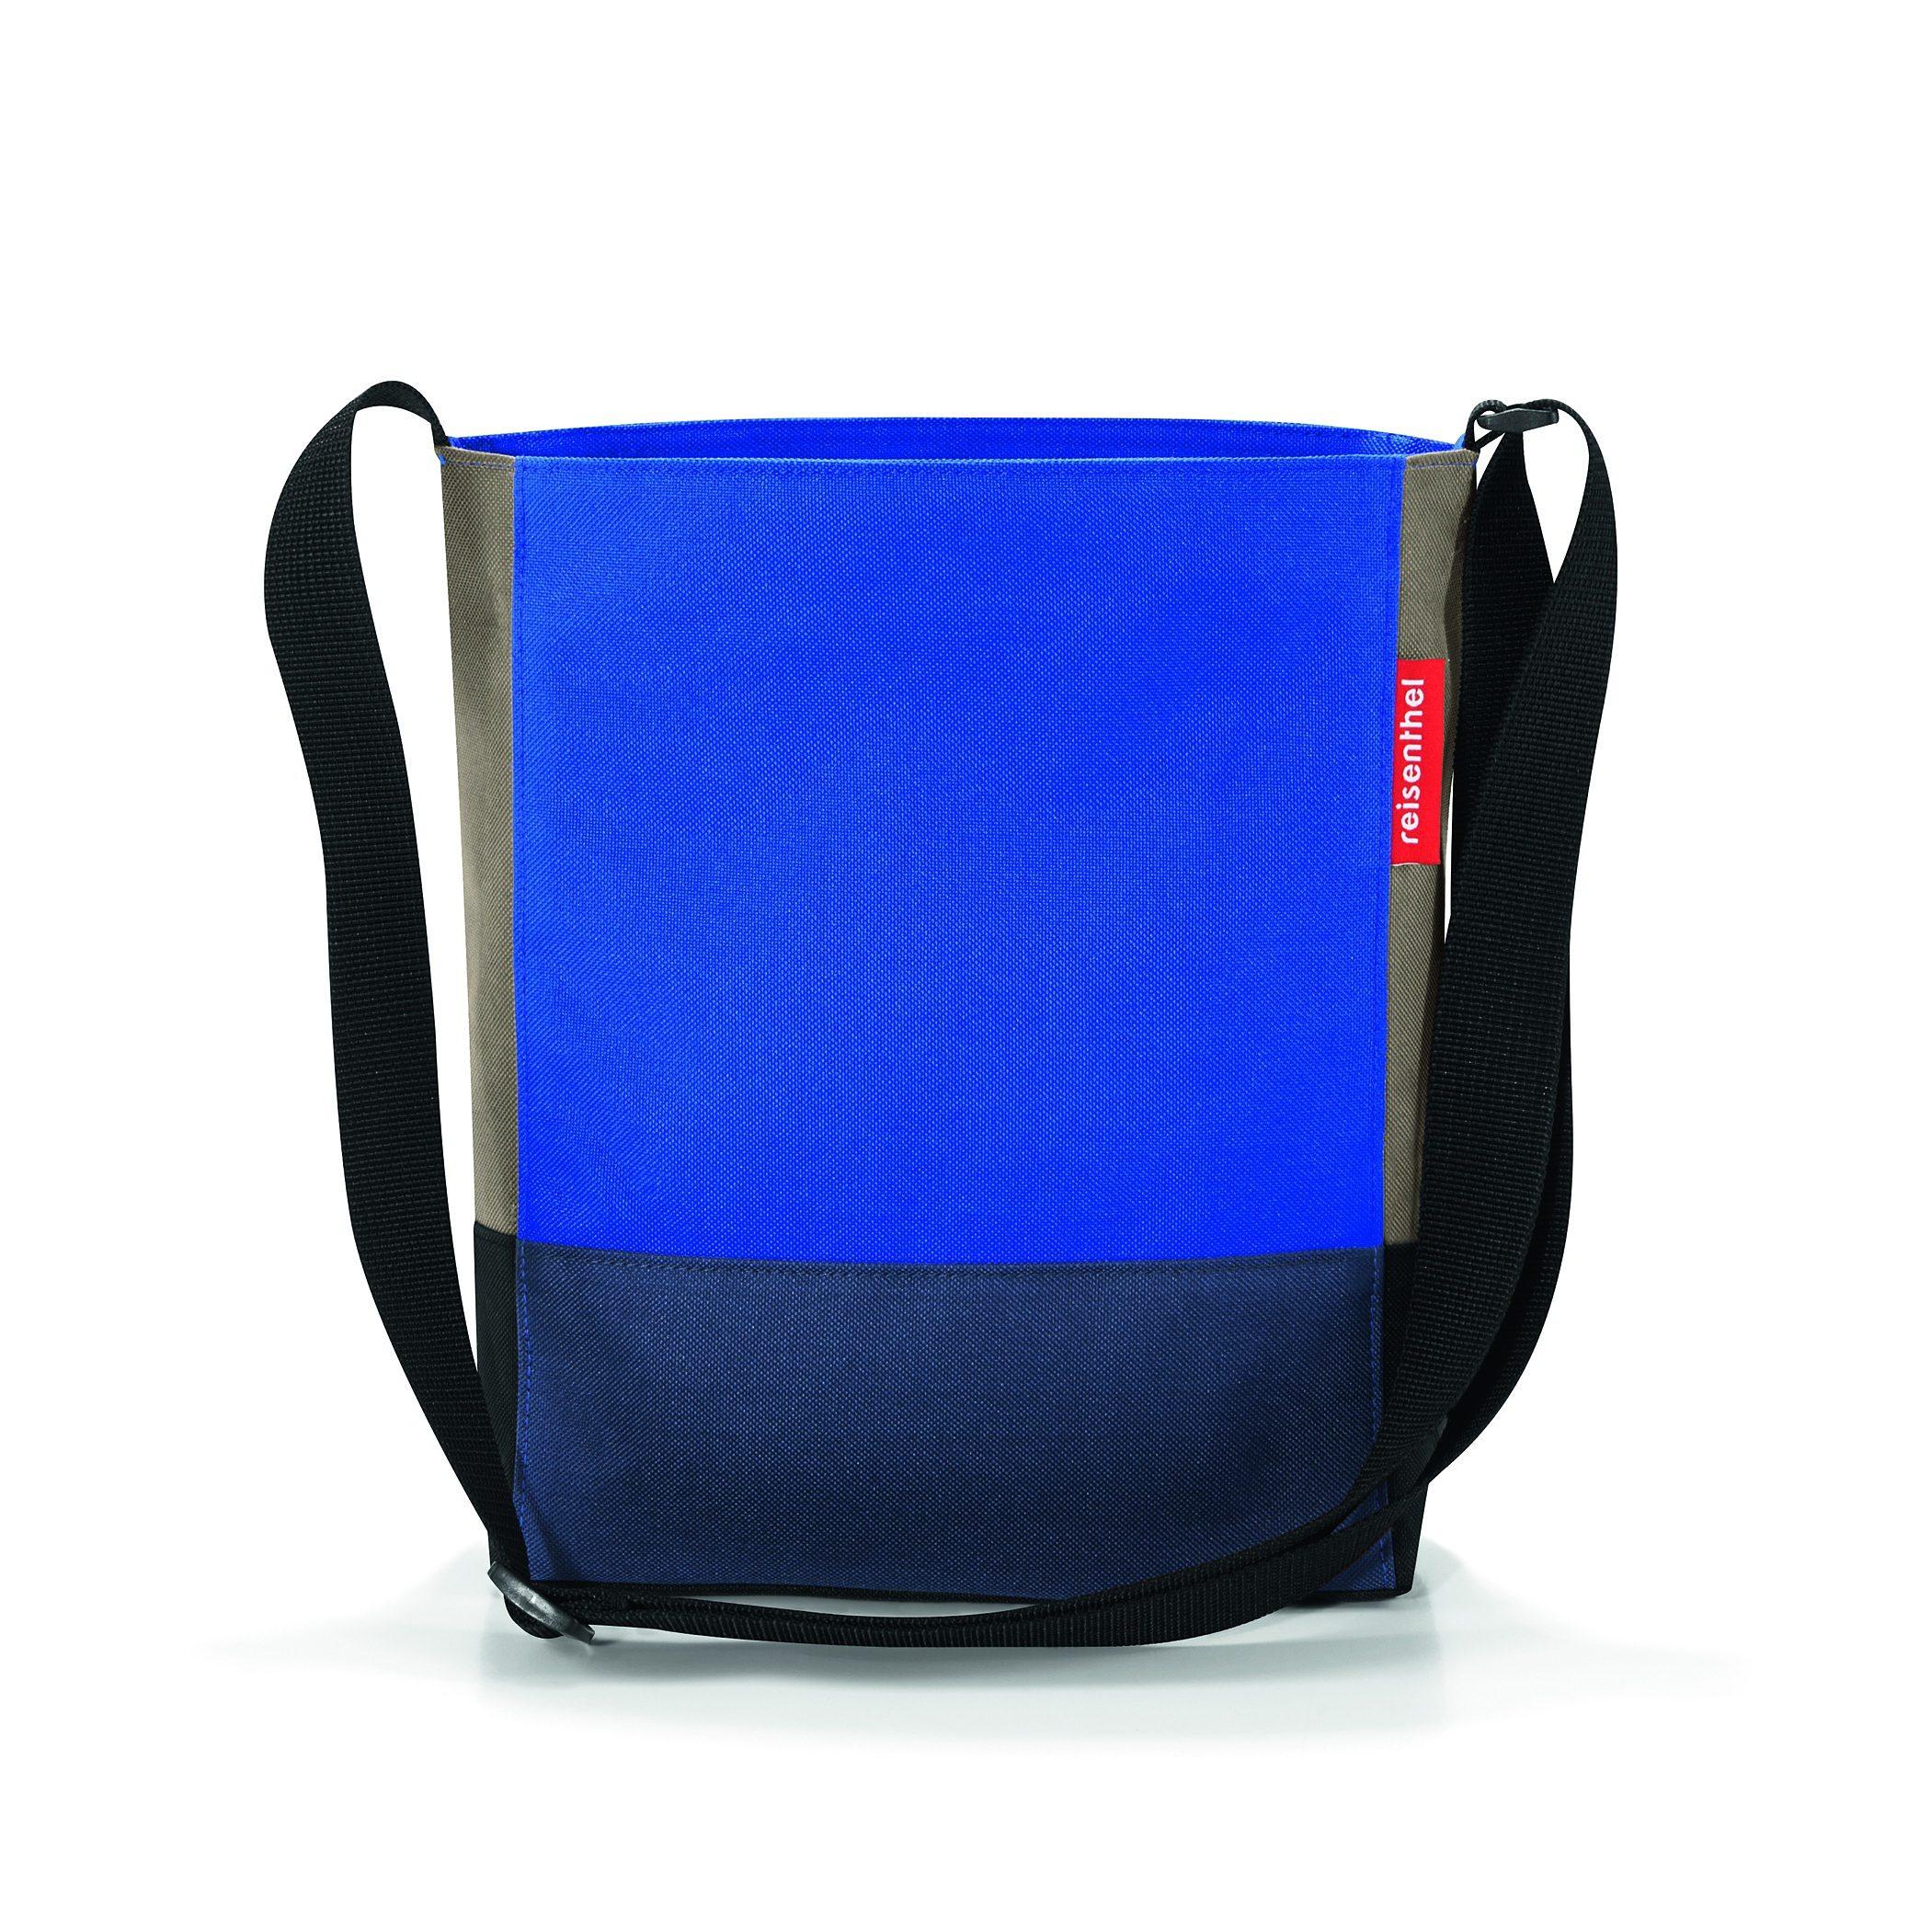 REISENTHEL® Shoulderbag S patchwork